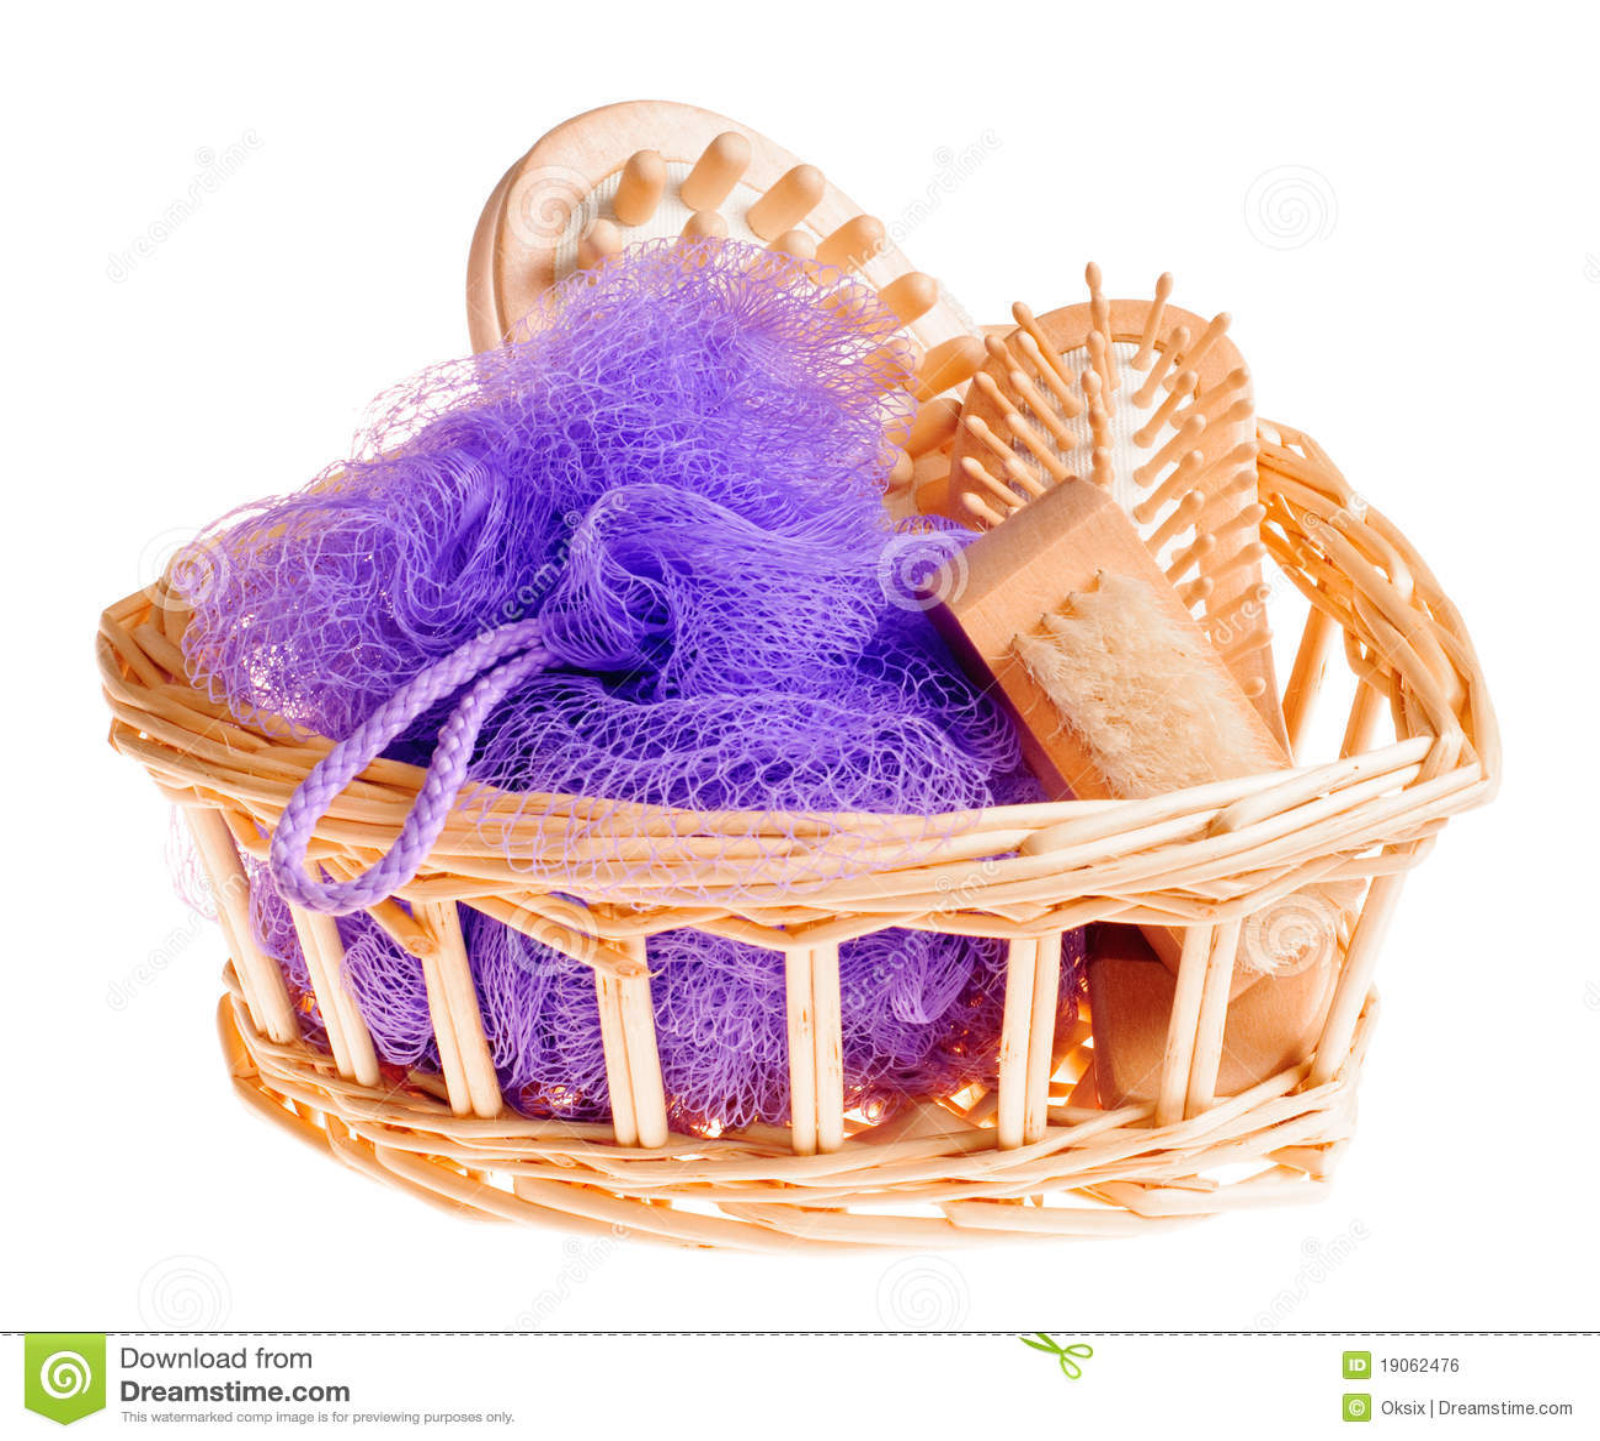 bath spa kit royalty free stock image image 19062476